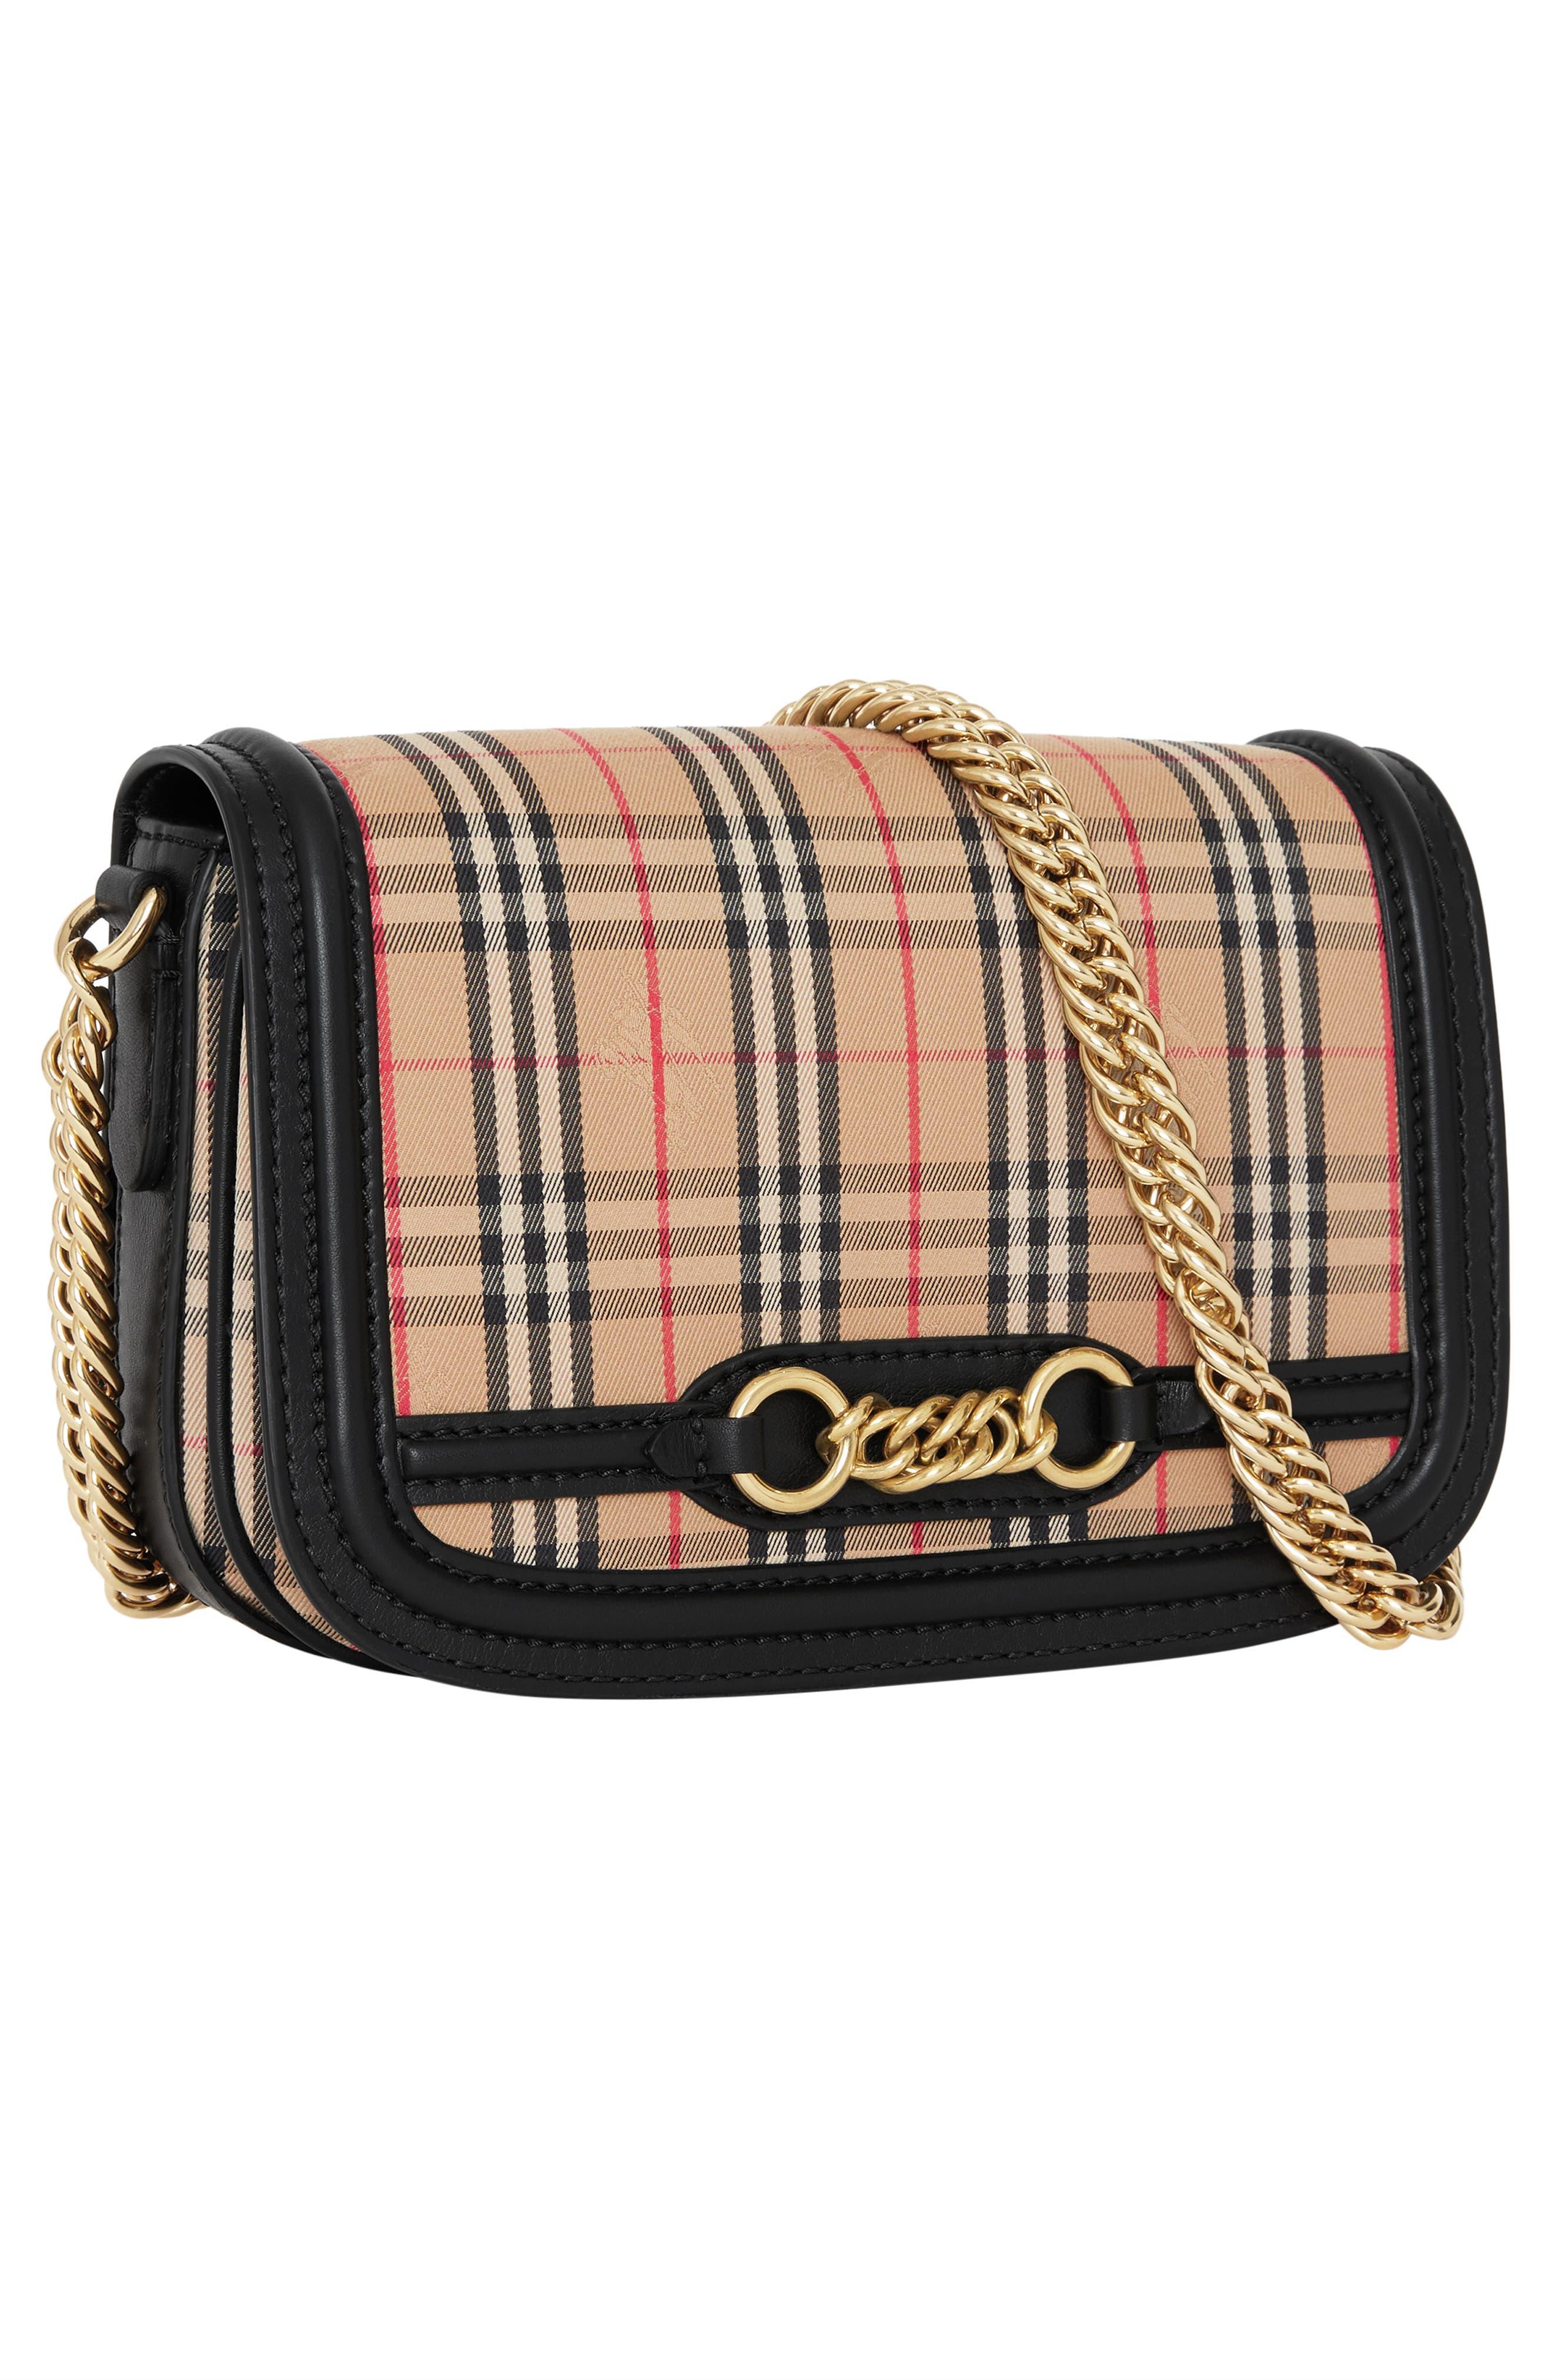 Vintage Check Link Flap Crossbody Bag,                             Alternate thumbnail 5, color,                             BLACK